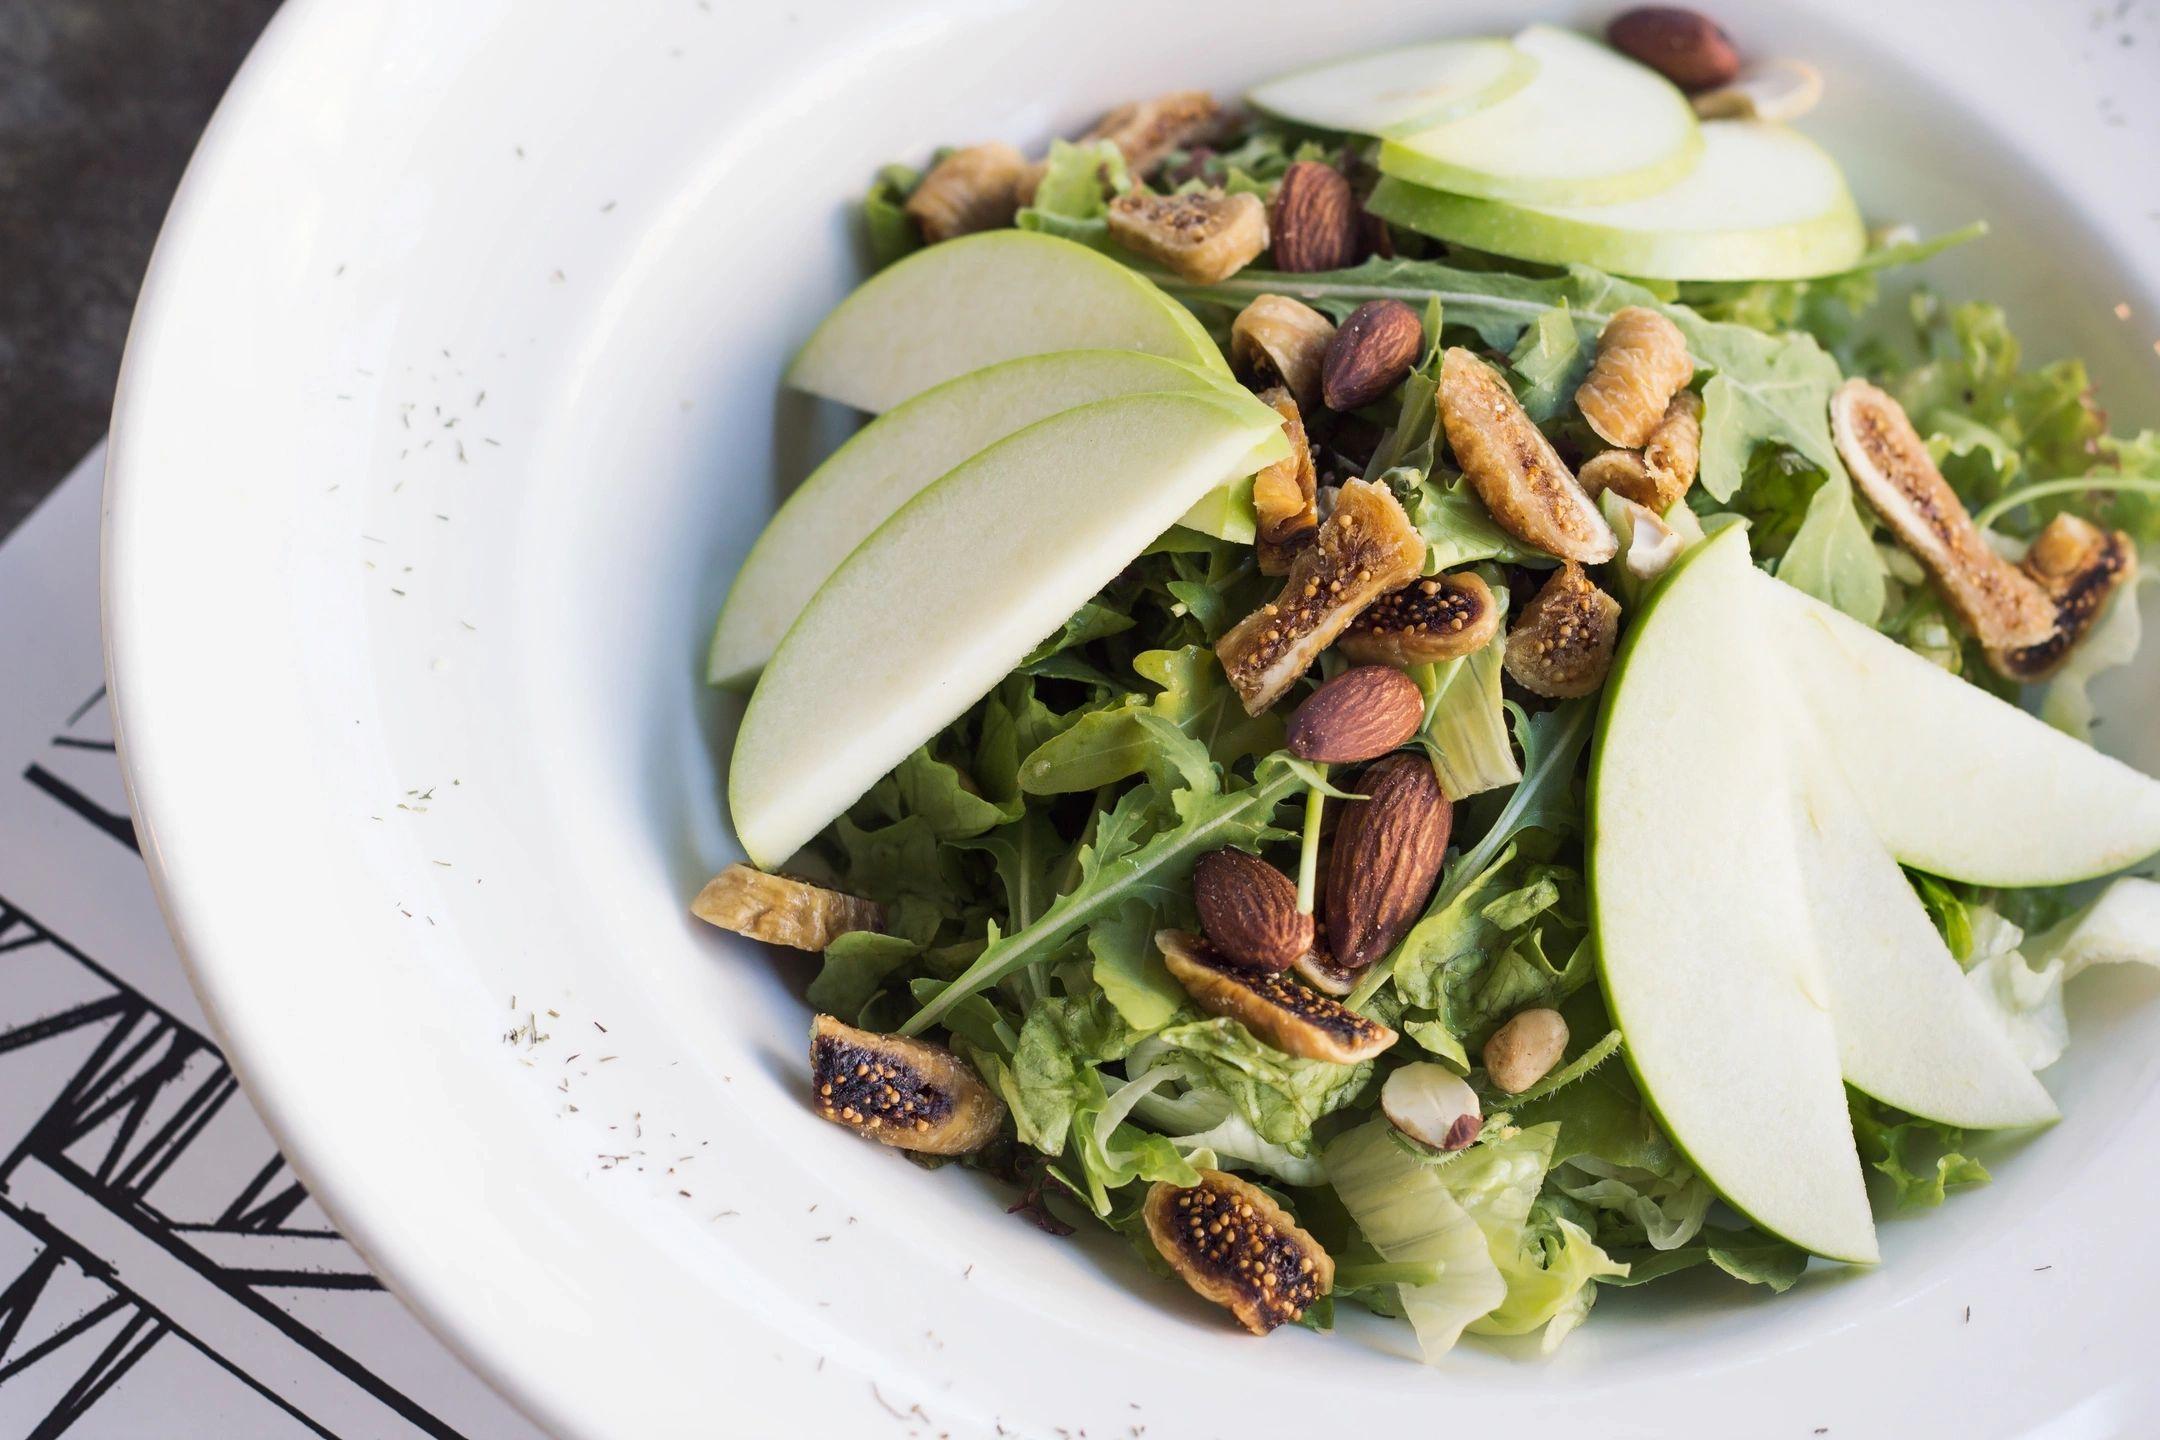 FILLED | Cashiers, Prep Cooks & Salad Makers – Reno, NV – $12 – $14/hr – All Shifts PT & FT